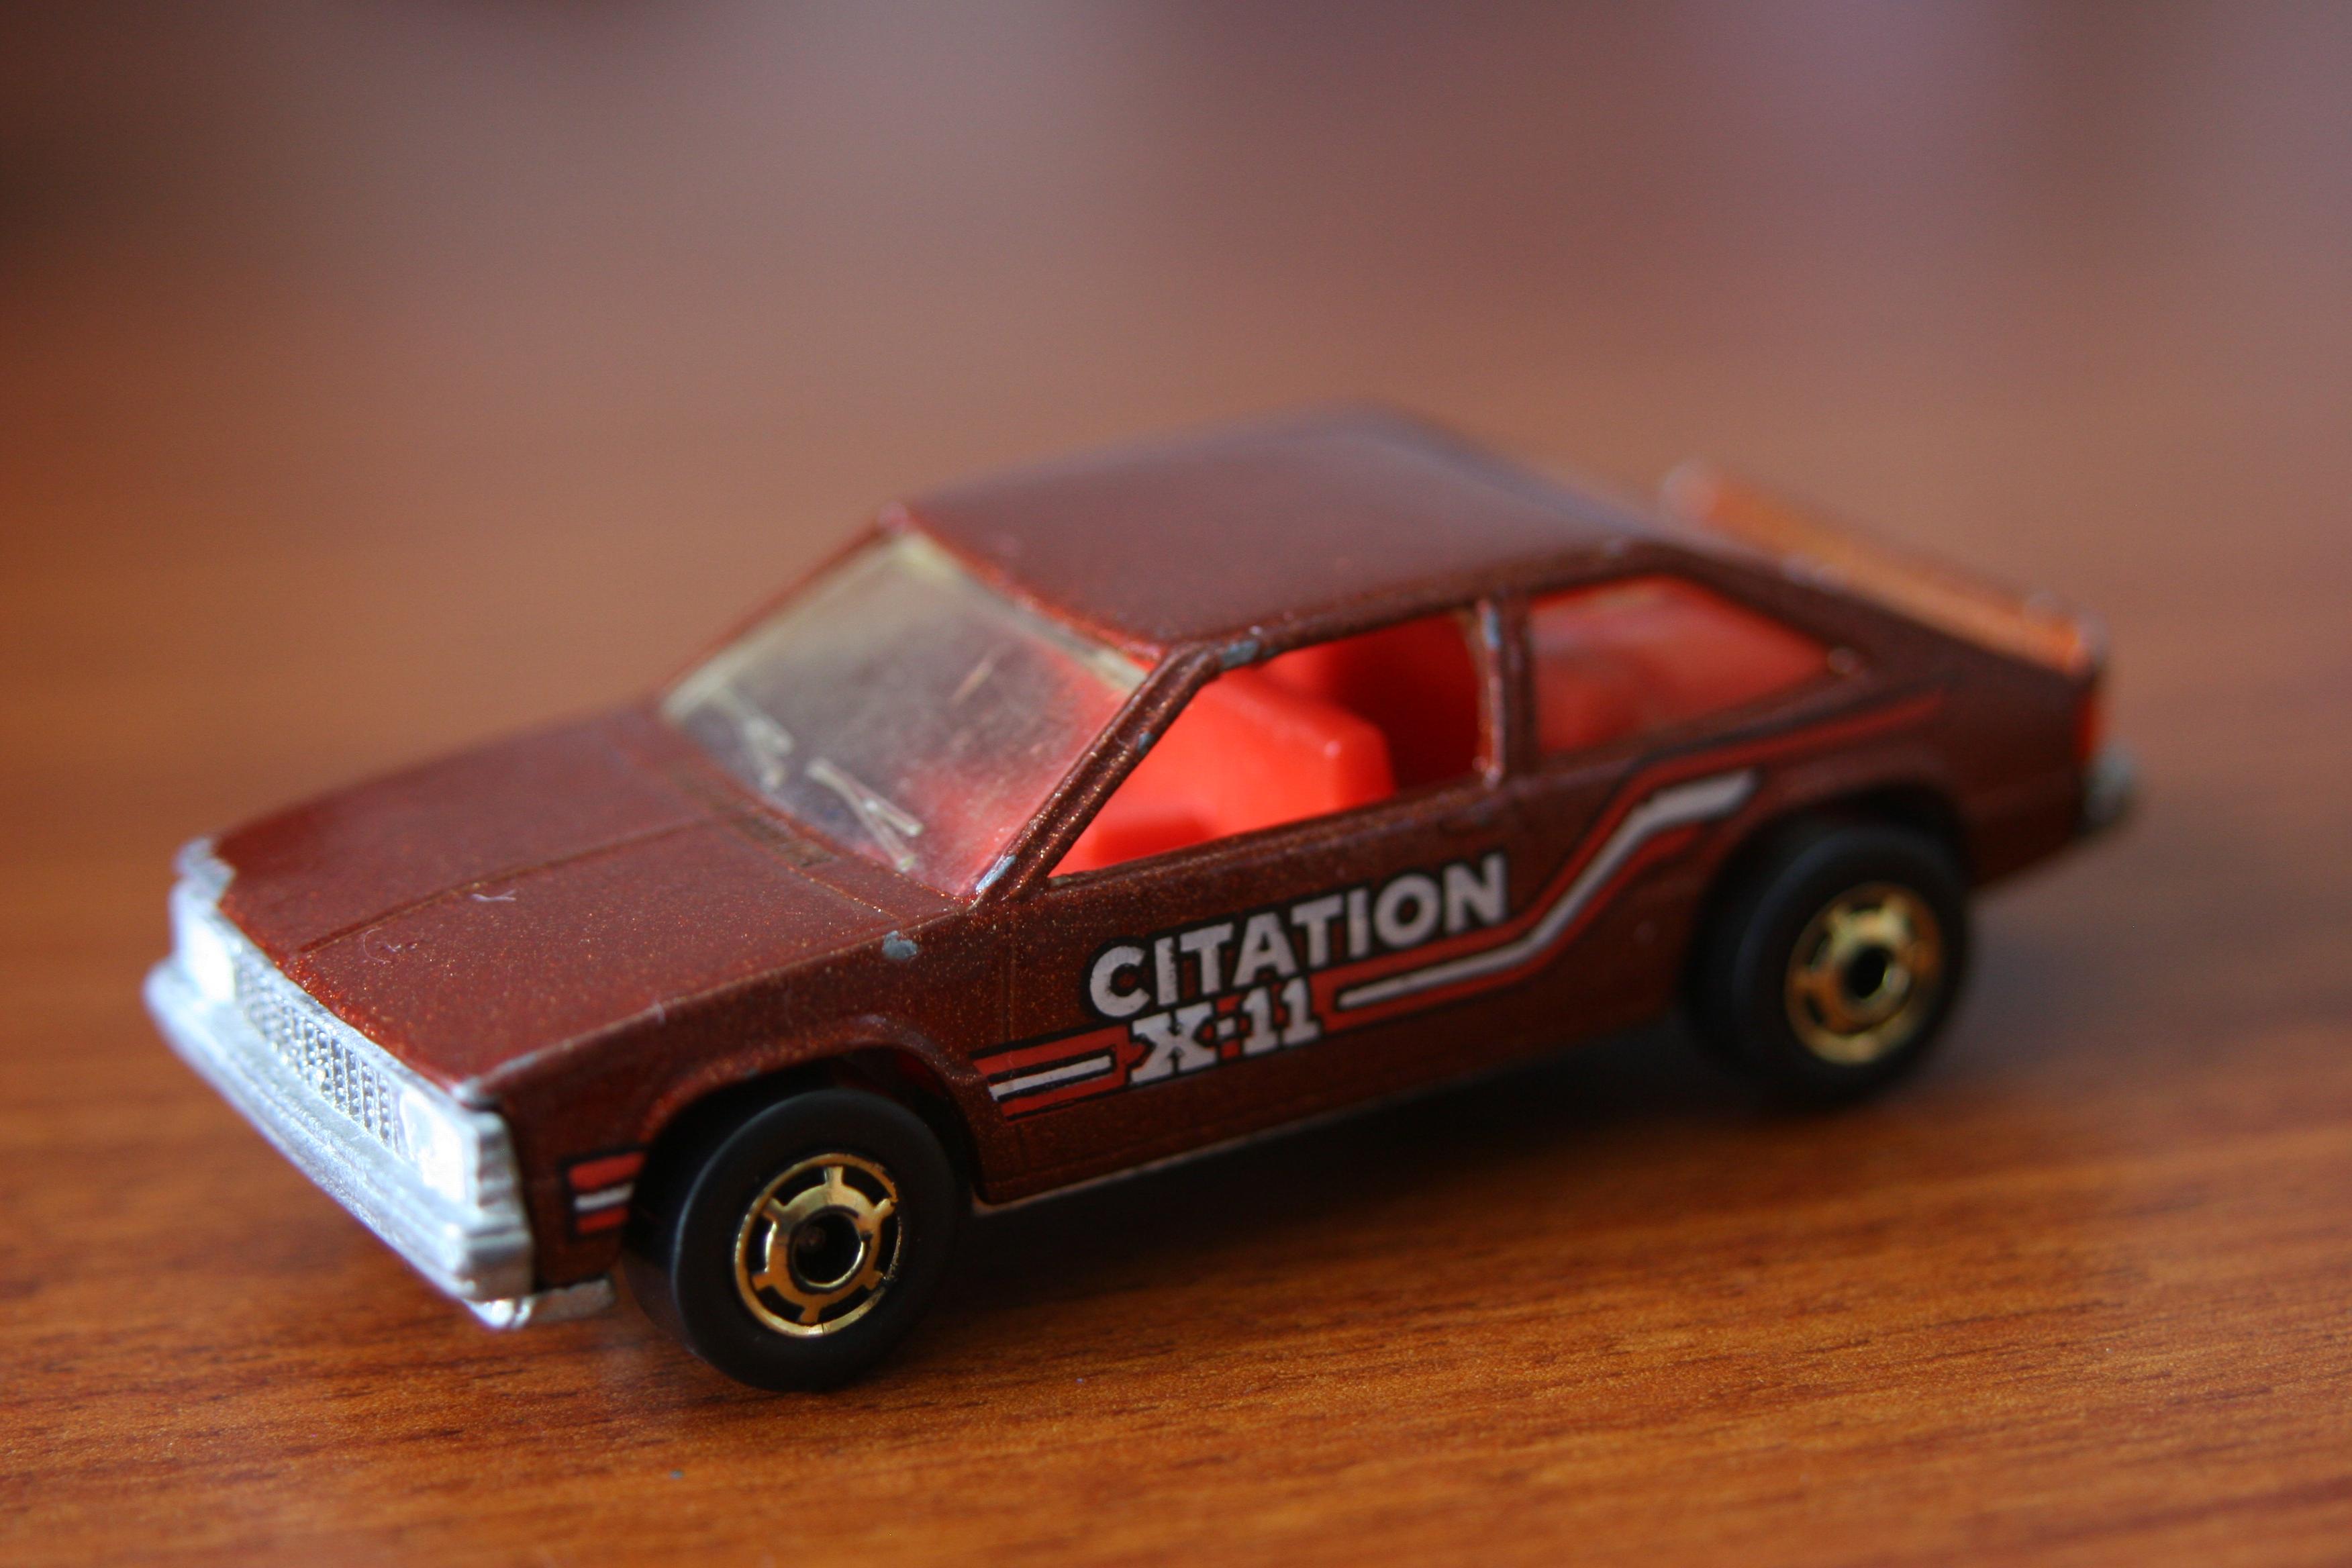 Chevy Citation